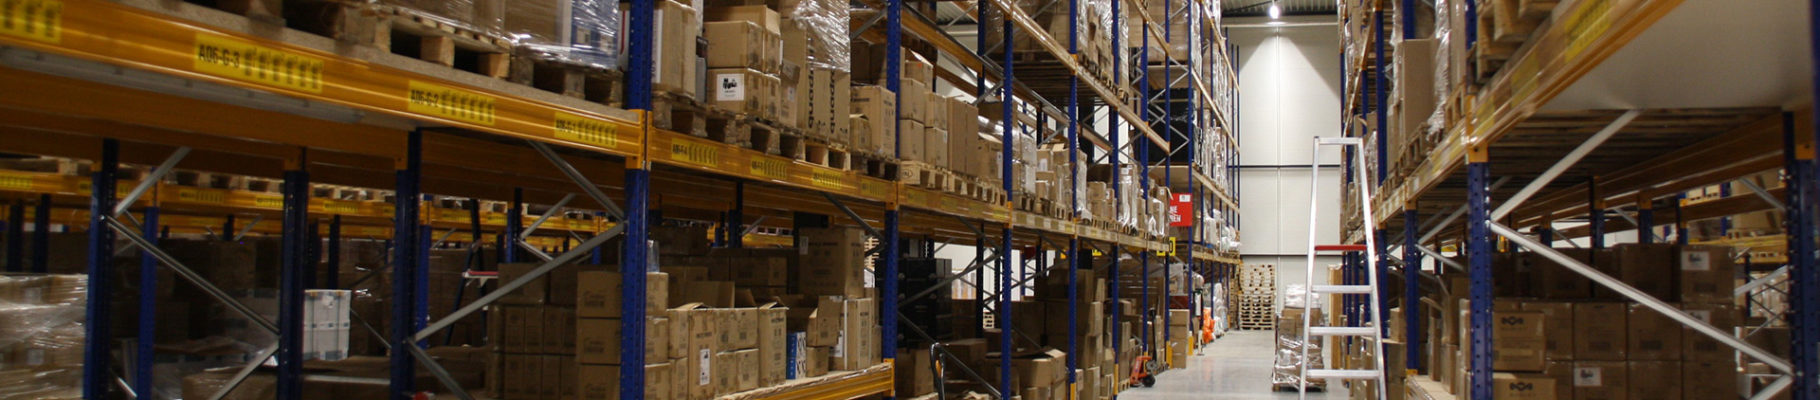 storage distribution opslag distributie cyberfreight nieuw vennep schiphol